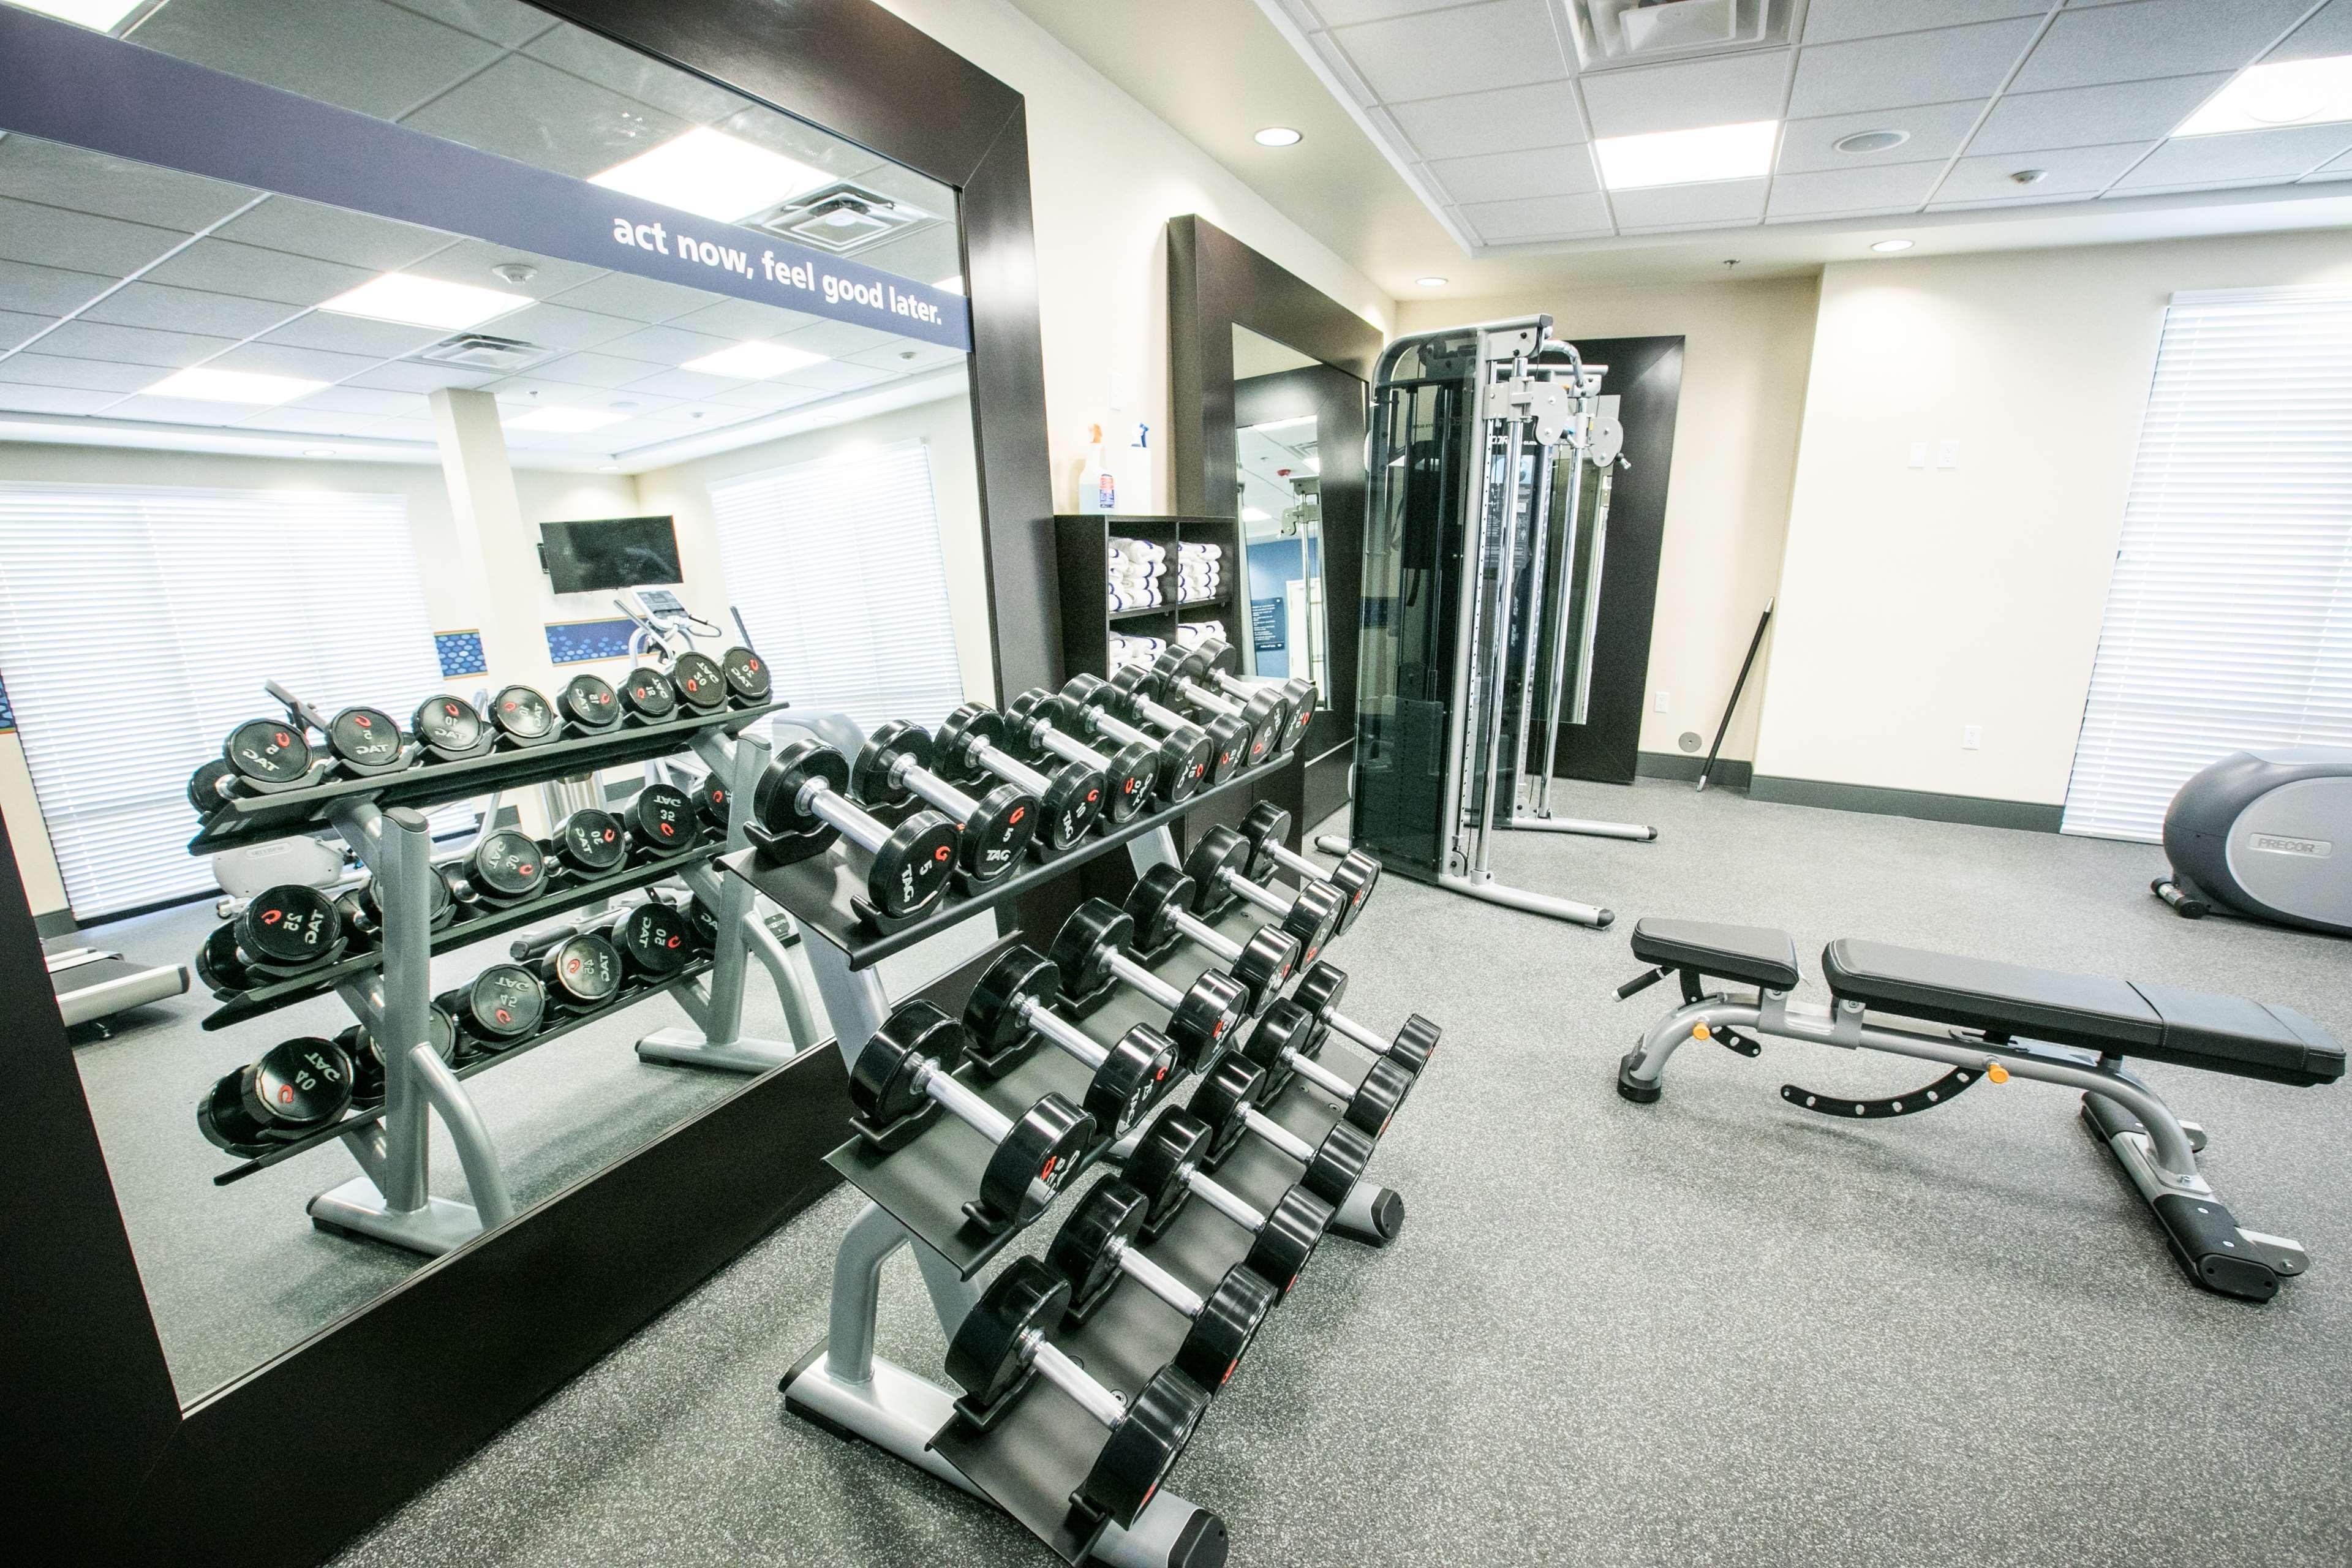 Hampton Inn & Suites Tempe - Phoenix Airport image 14